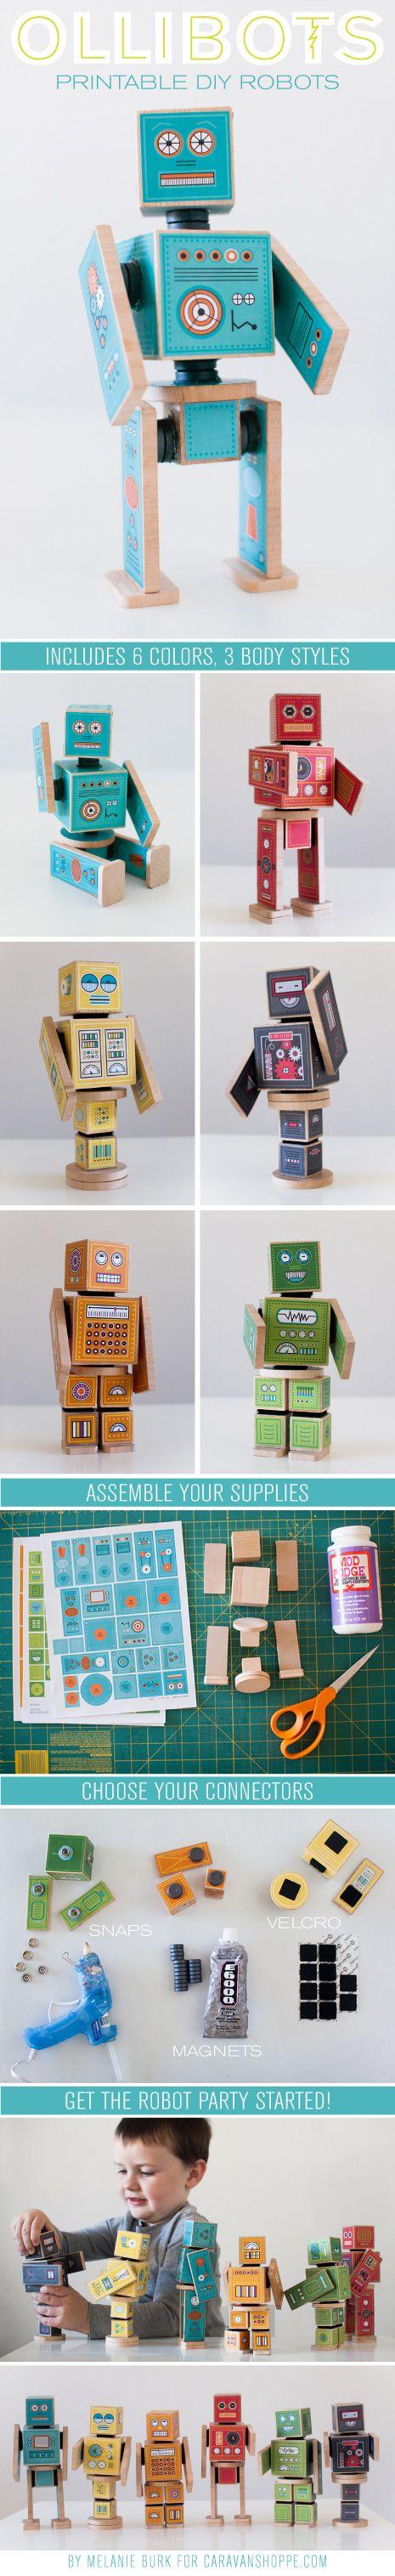 Build your own robot blocks